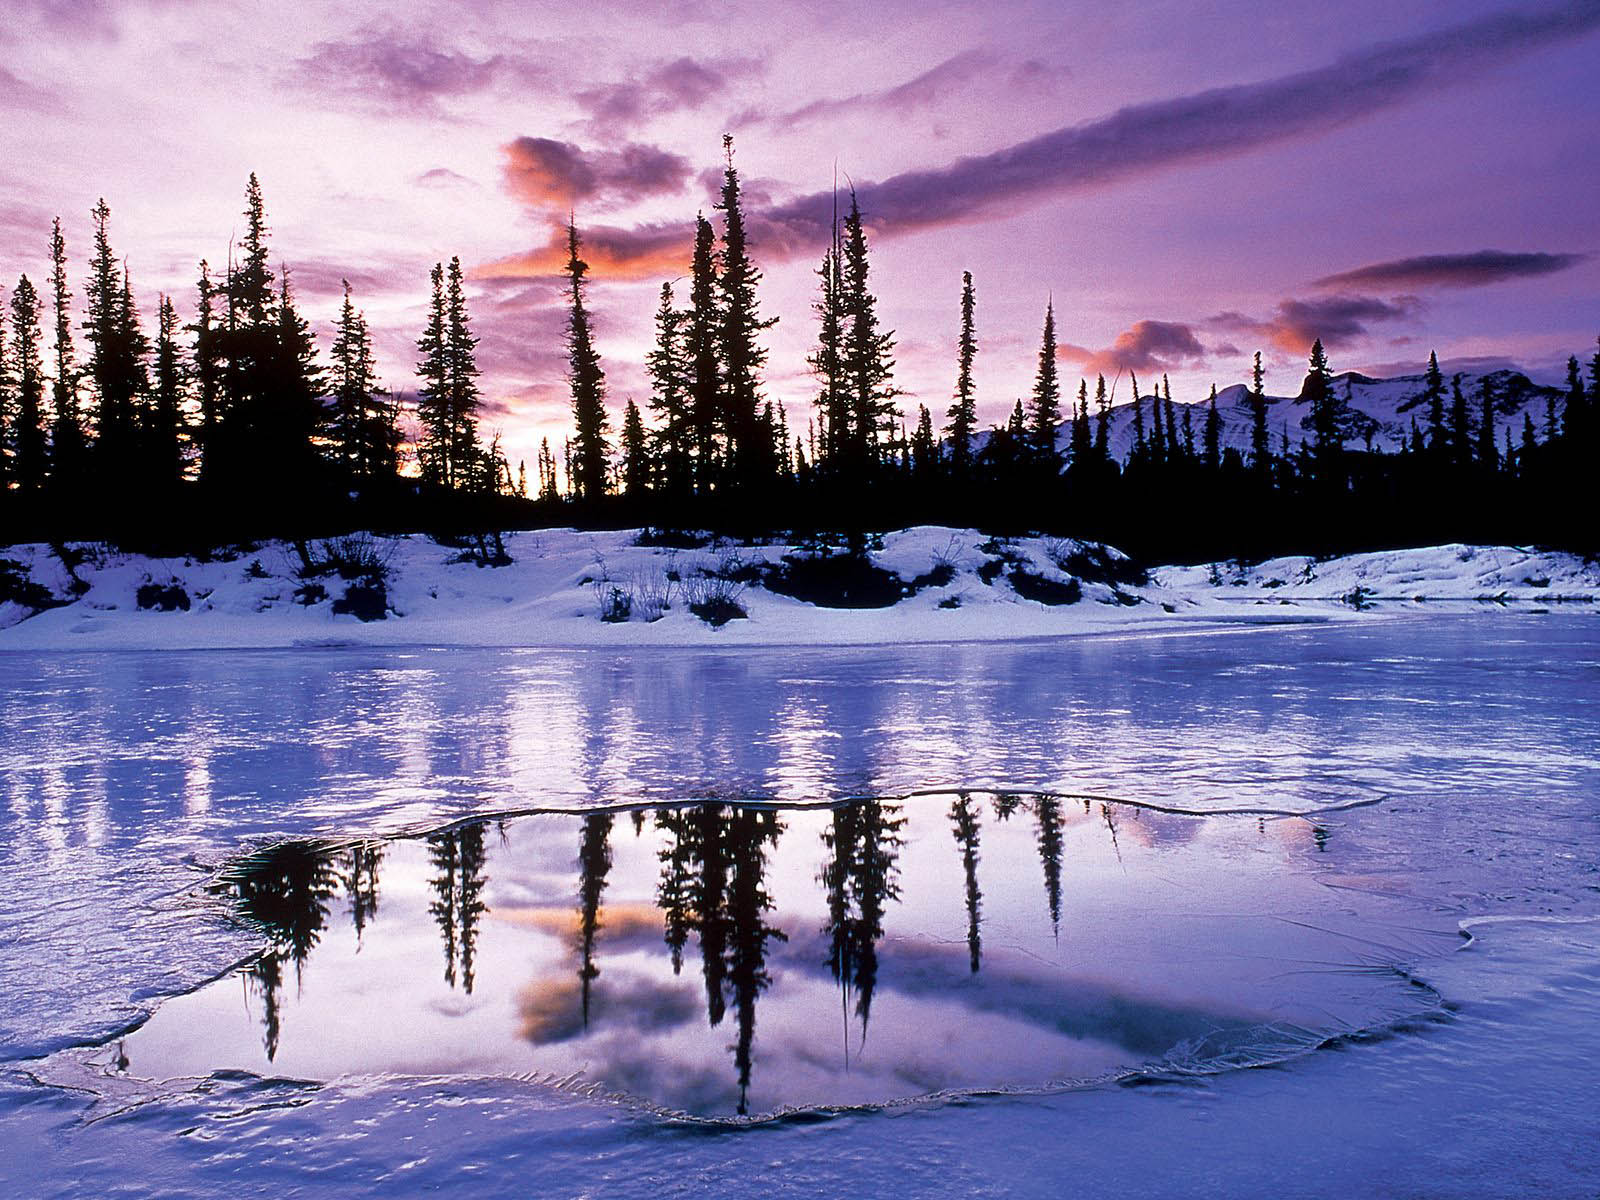 Winter Desktop Wallpapers and Backgrounds 1600x1200